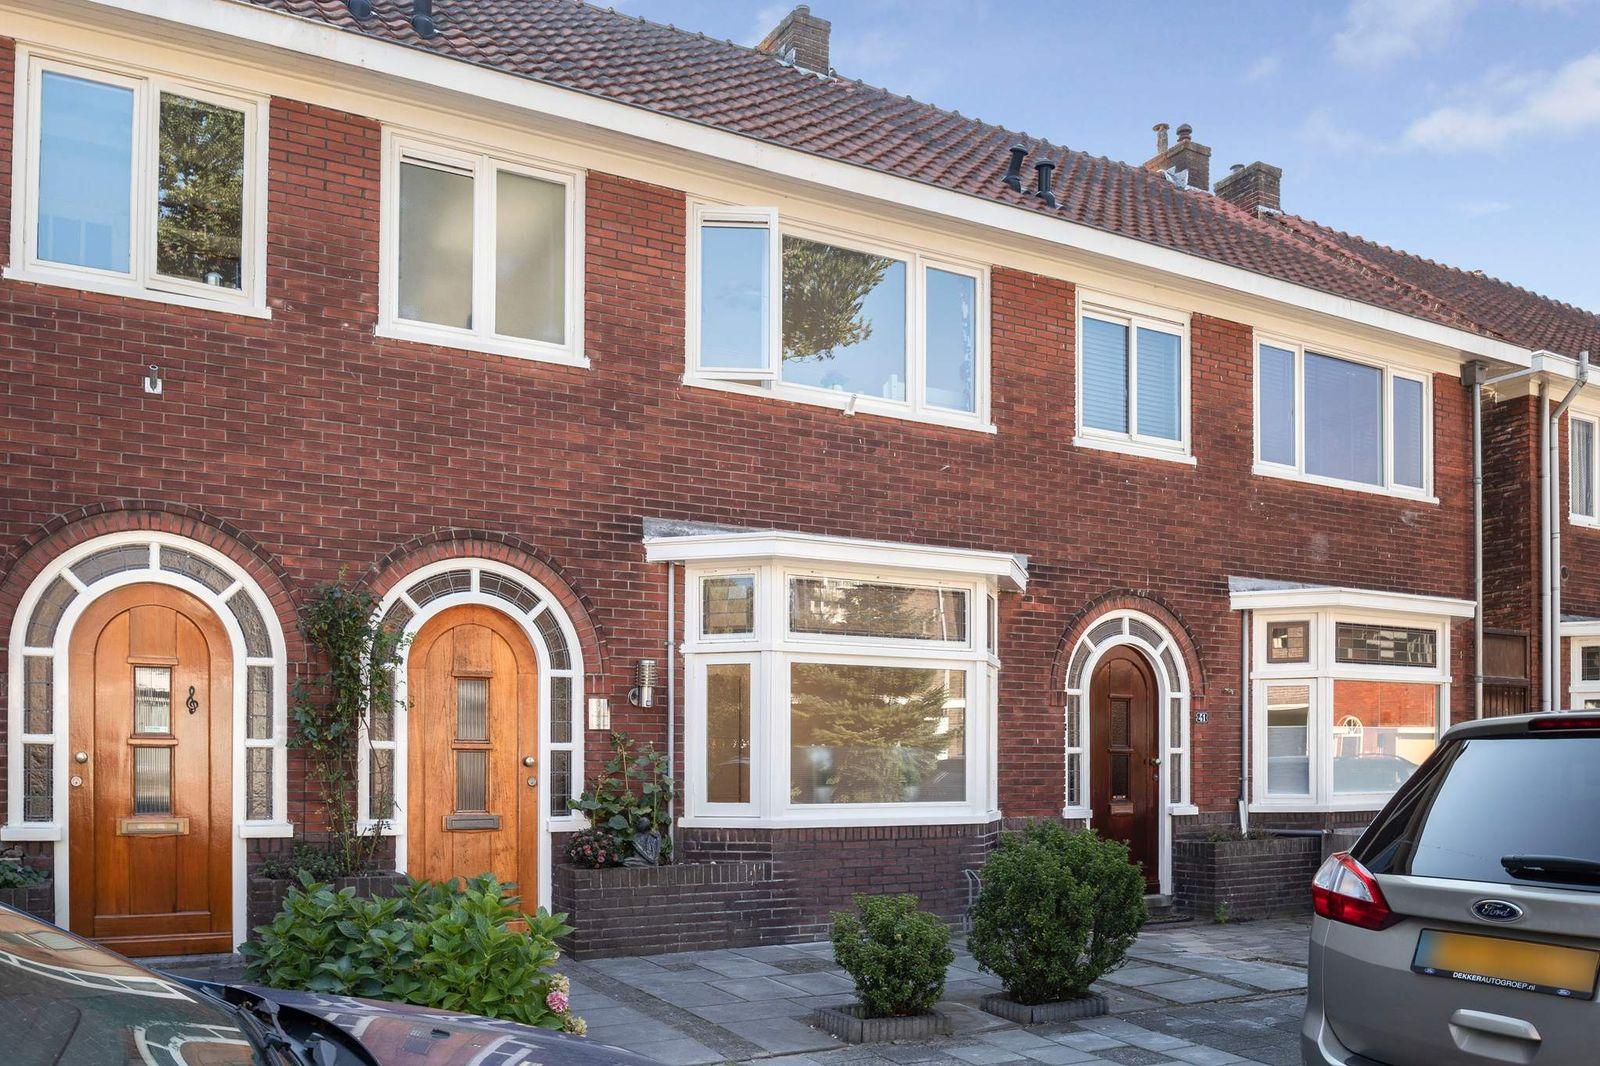 Frans Halsstraat 39, Zaandam